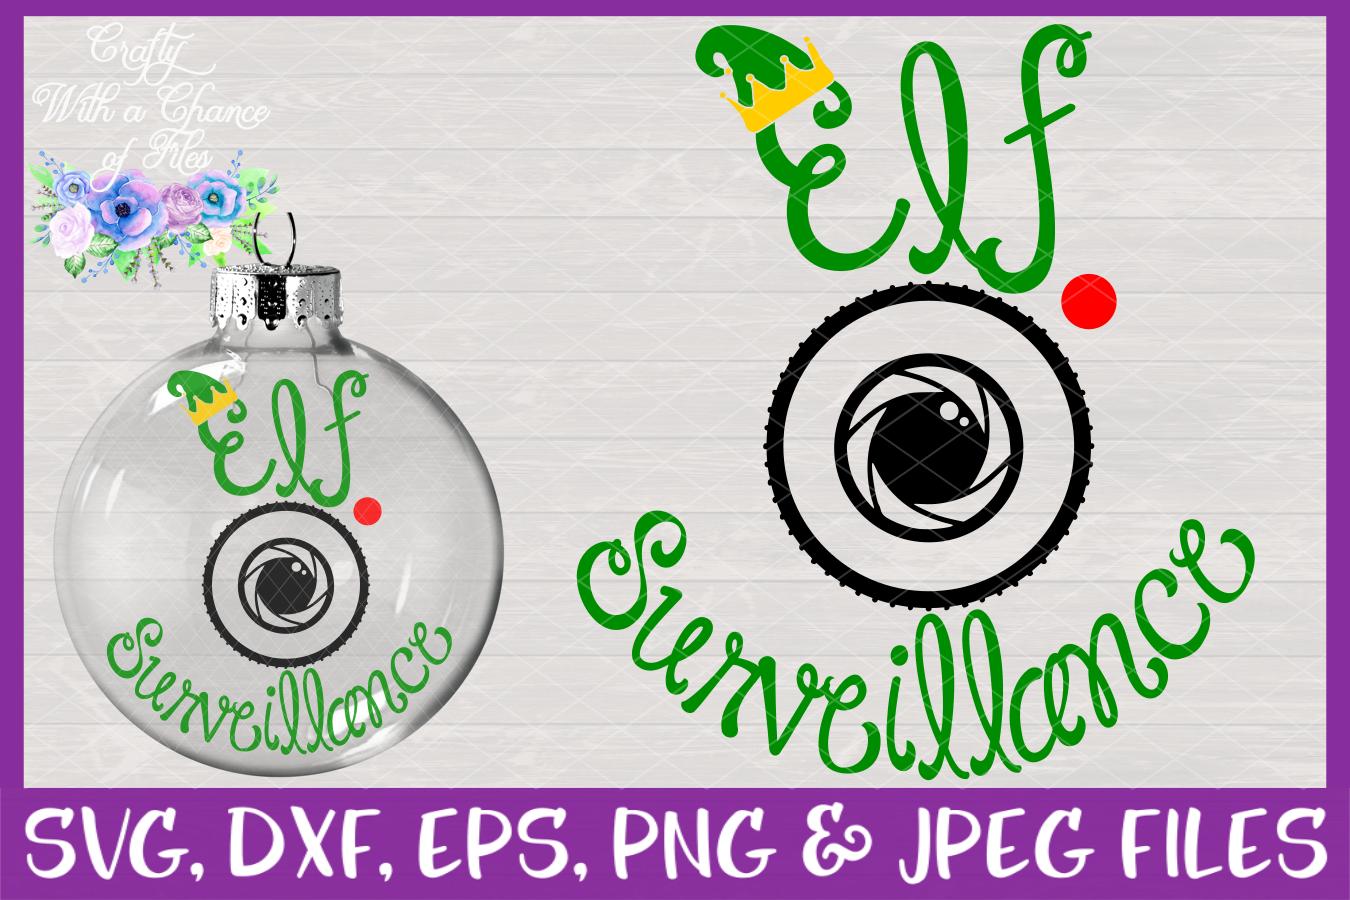 Elf Surveillance SVG - Christmas Ornament Design example image 1